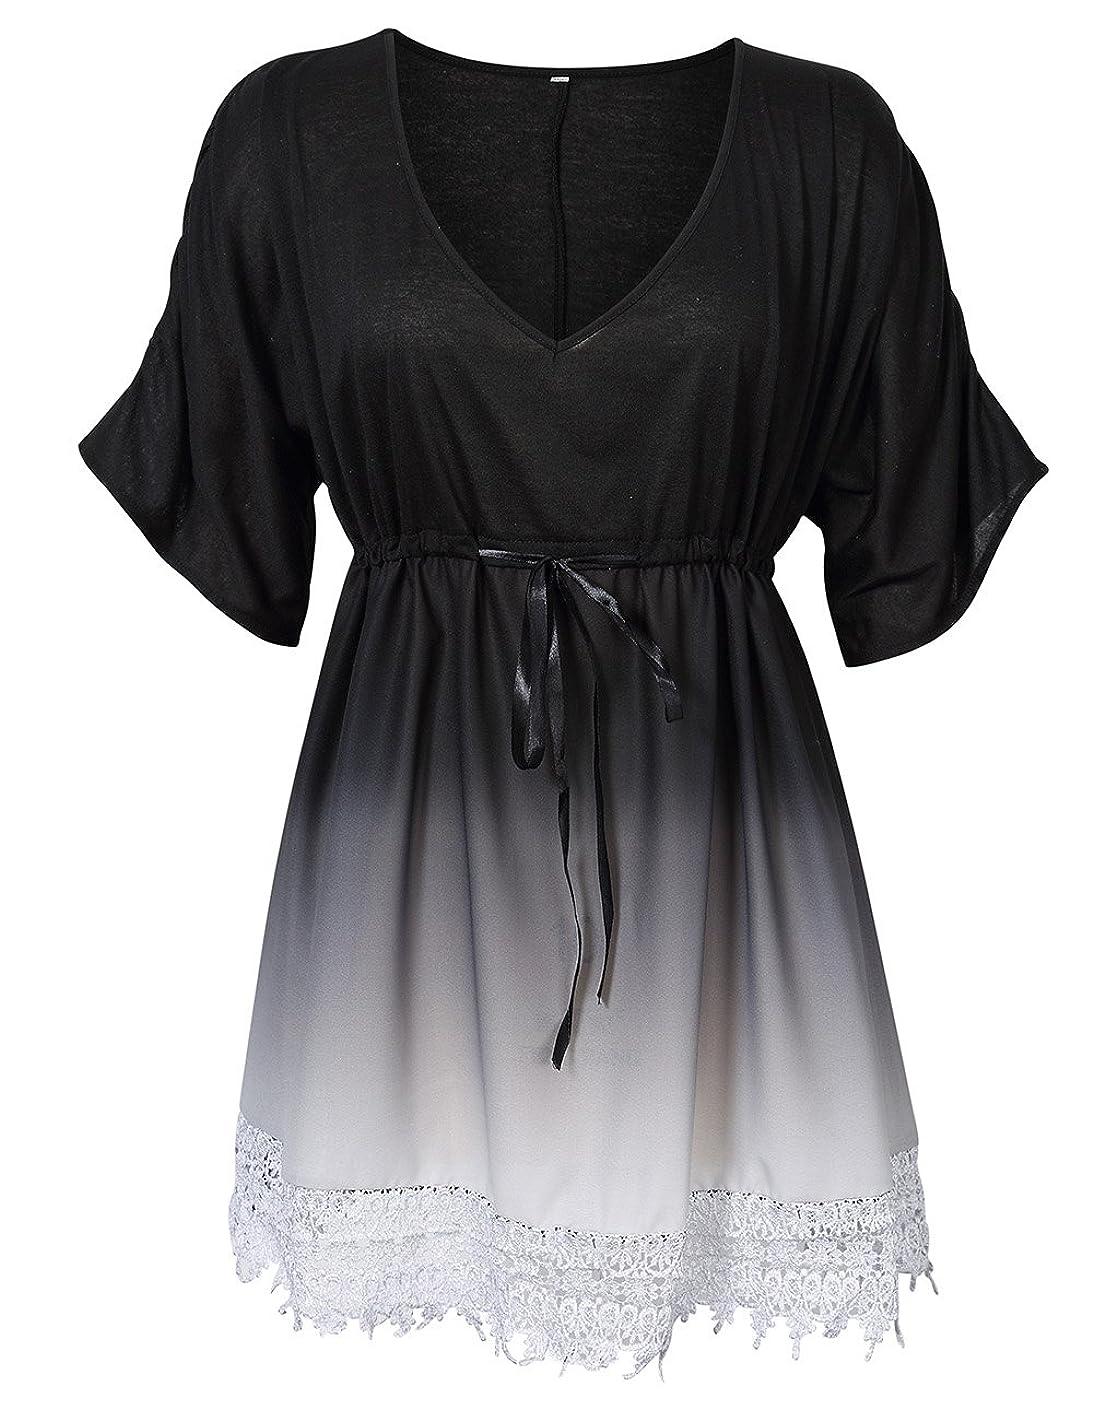 AMZ PLUS Womens Plus Size Gradient Ombre Lace V Neck Joint Sleeve Mid-Long Tunic Midi Dress